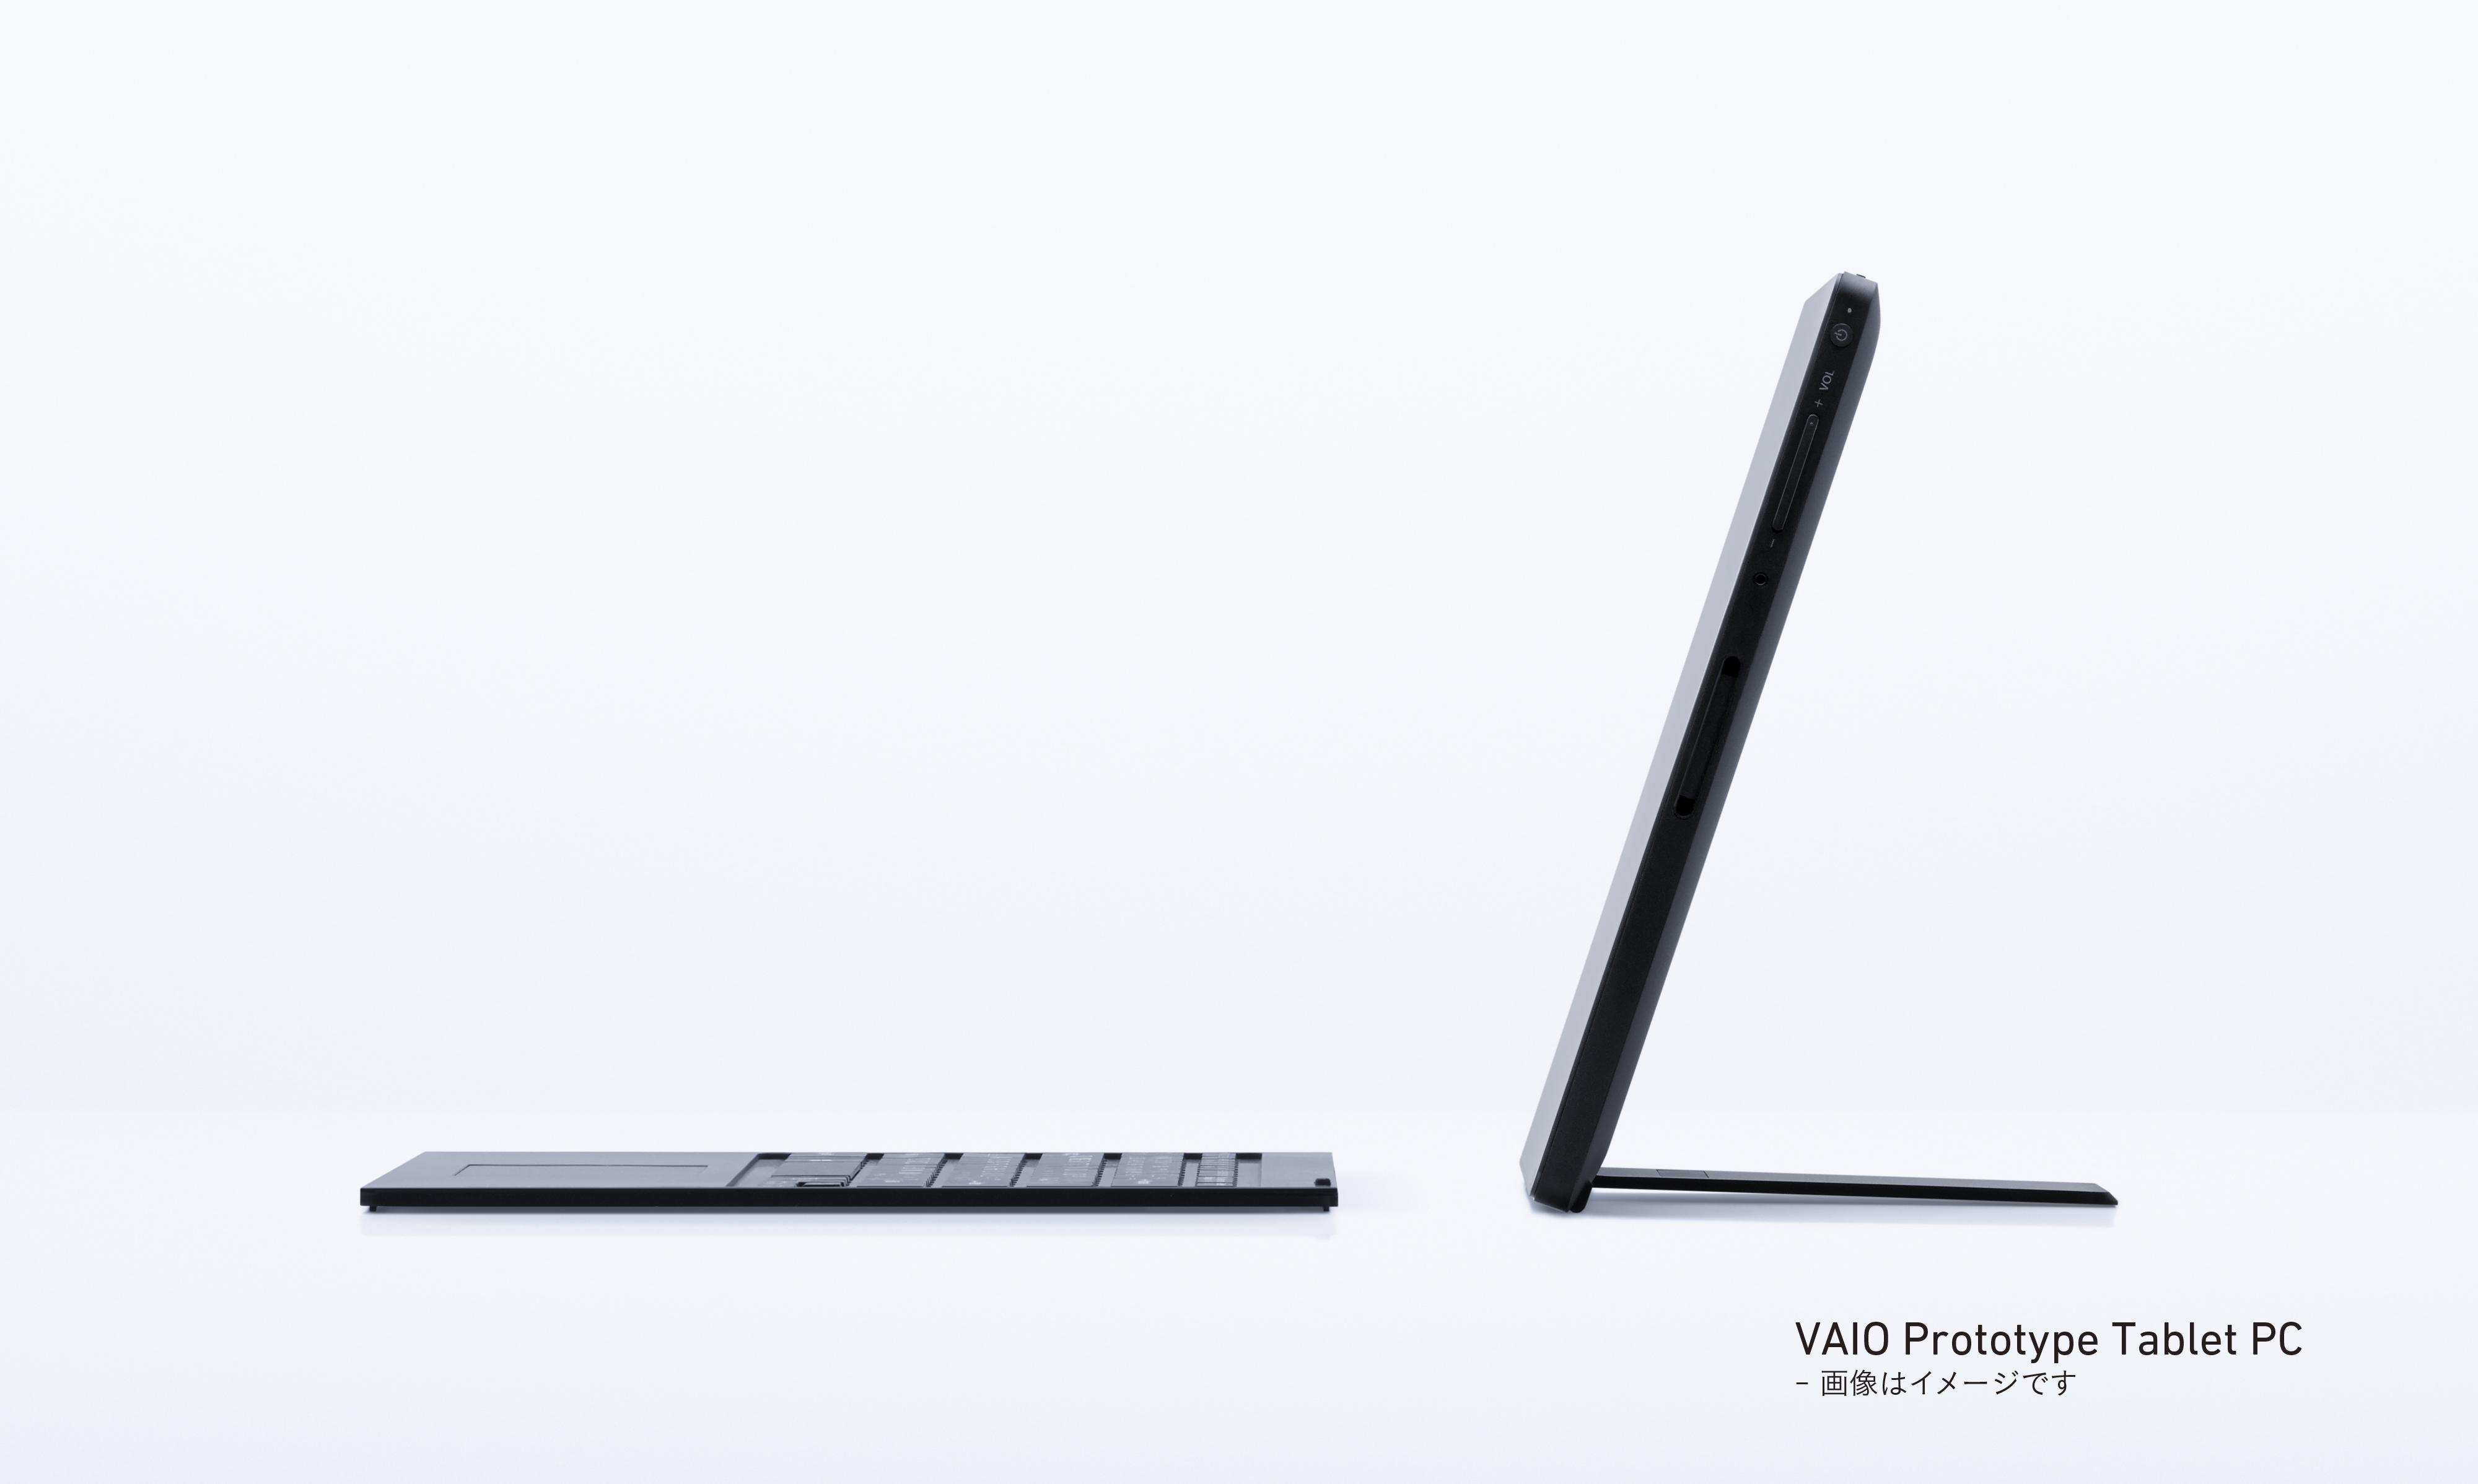 VAIO Prototype Tablet PC side